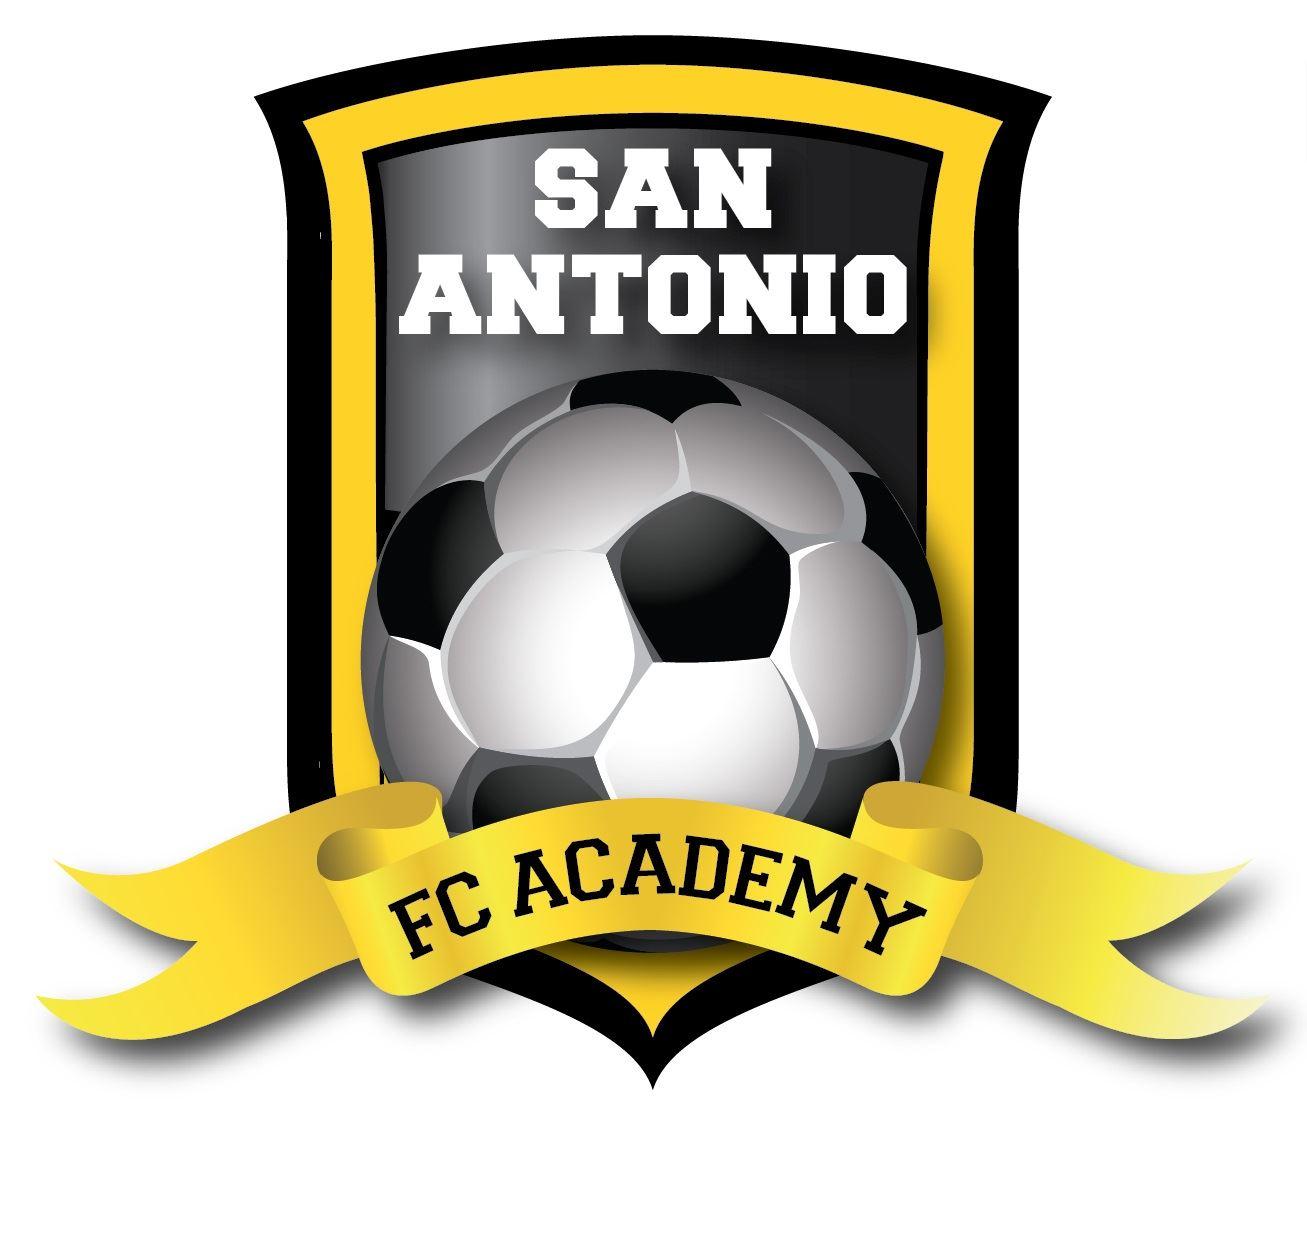 San Antonio FC - 03 Academy Pit Bulls